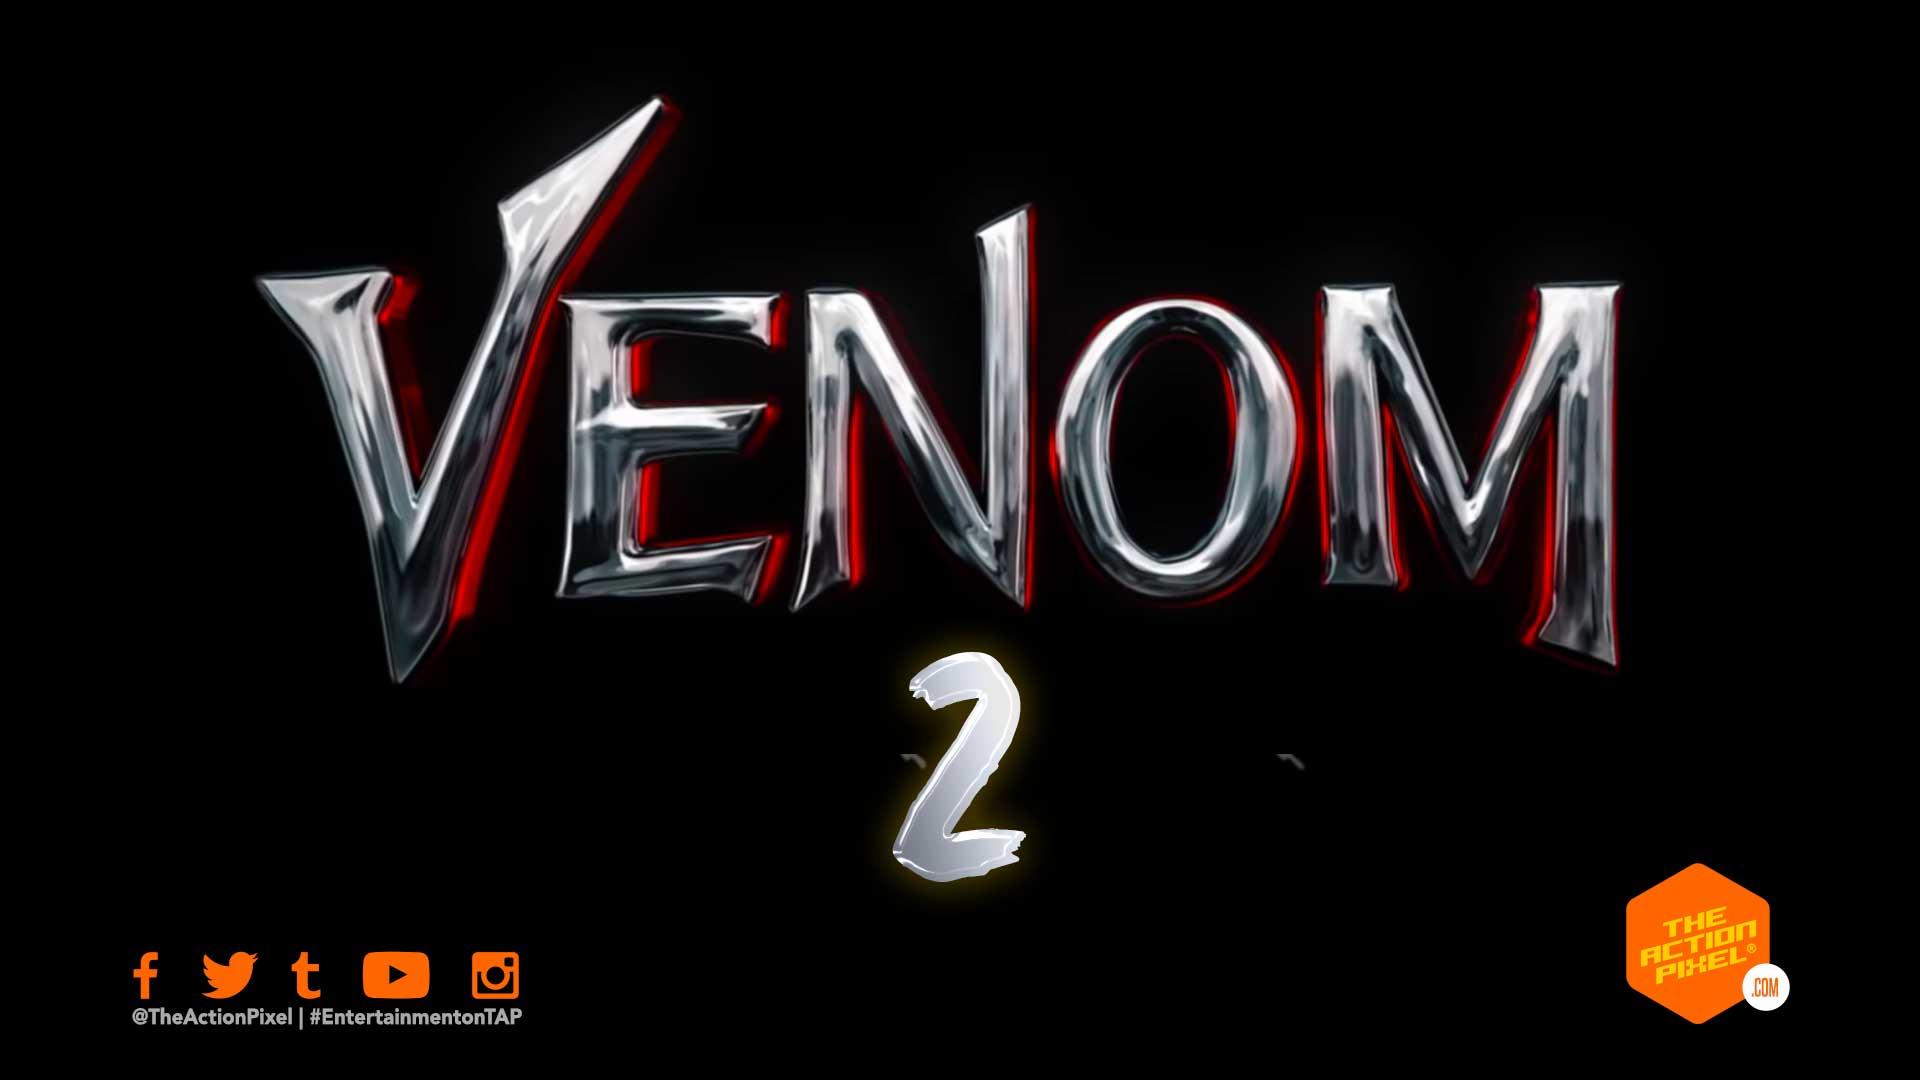 venom, venom: let there be carnage, let there be carnage, venom 2, Sony